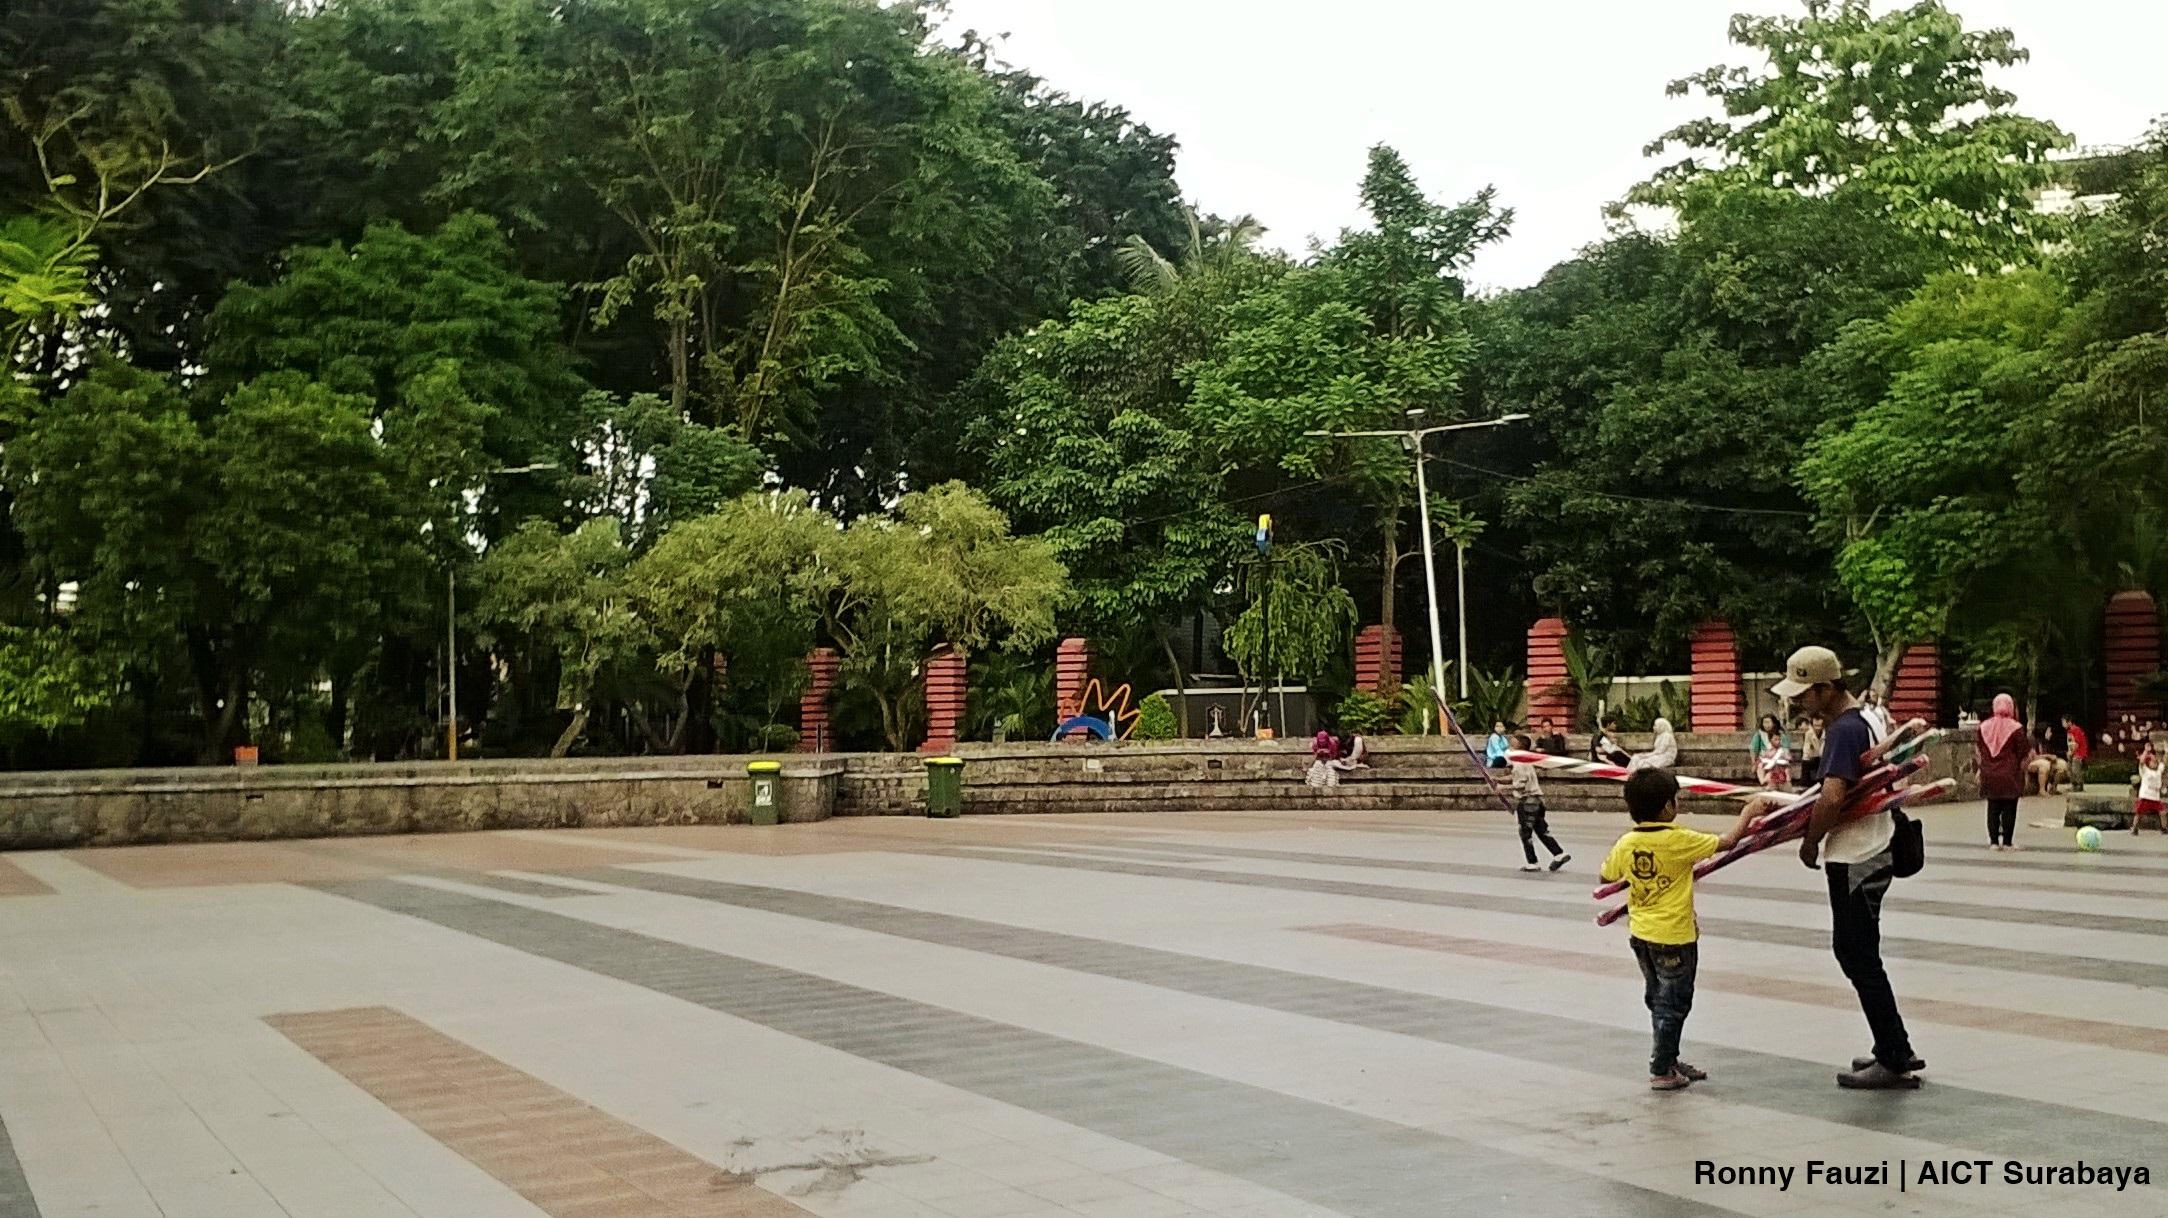 Suasana Plaza Amfiteater Taman Bungkul Aict Surabaya Sunan Mbah Kota